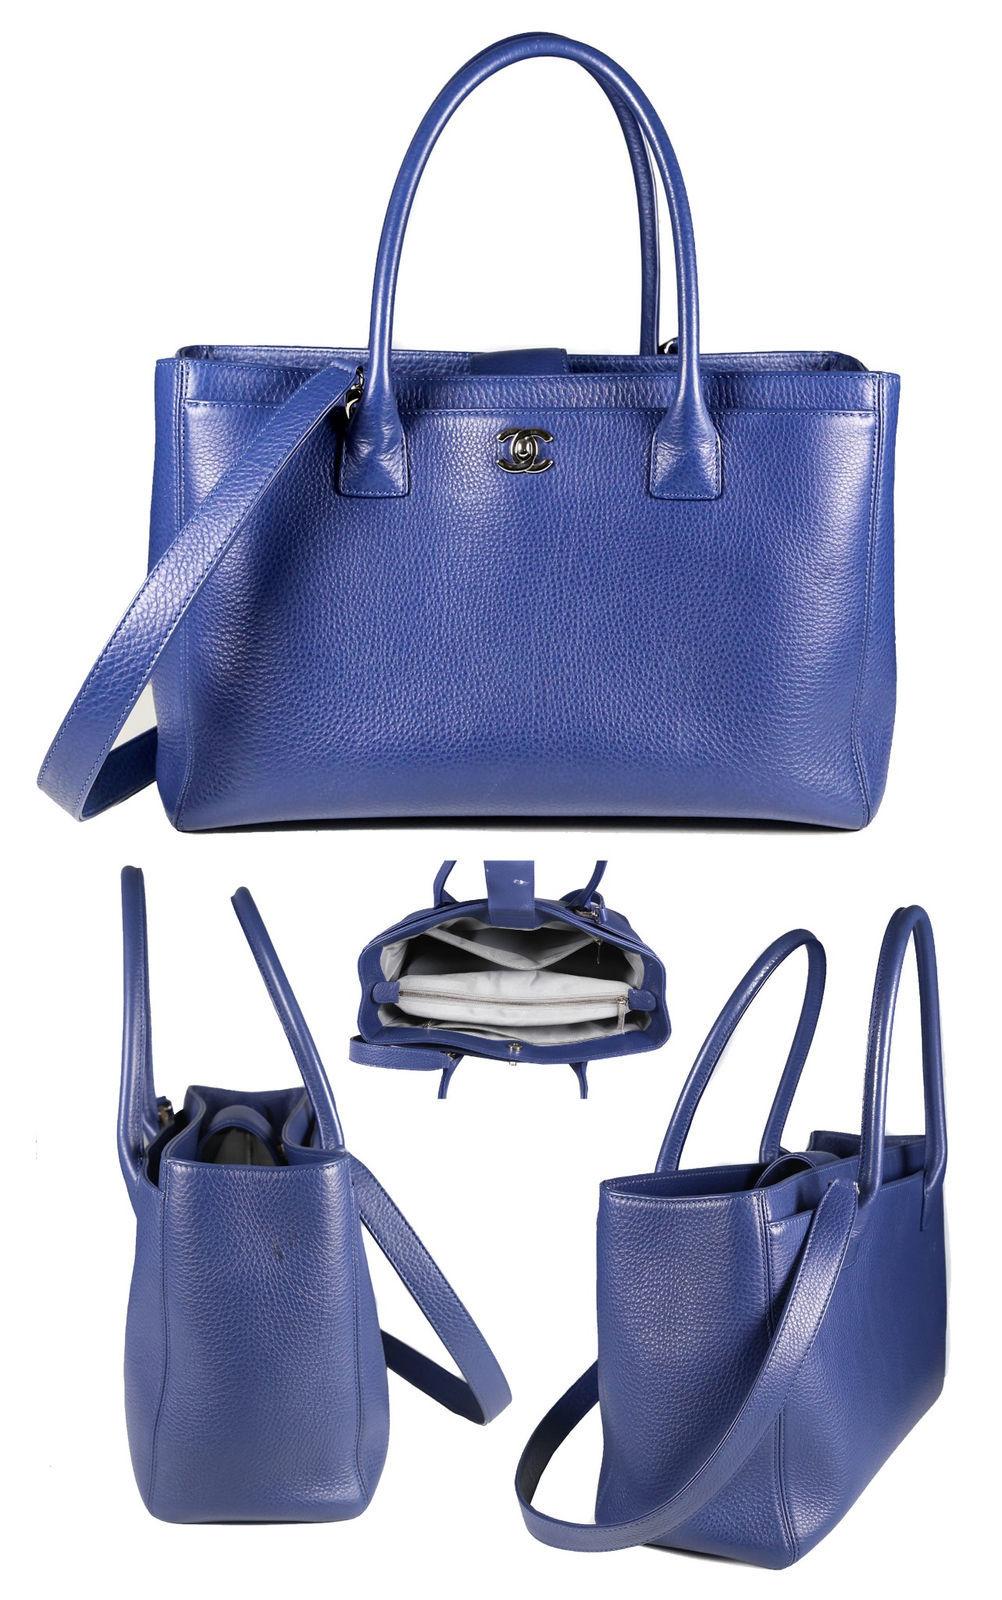 97cef5a4ef57 Authentic CHANEL Executive Cerf Blue Calfskin Caviar Shopper Tote Bag -  $2,195.00